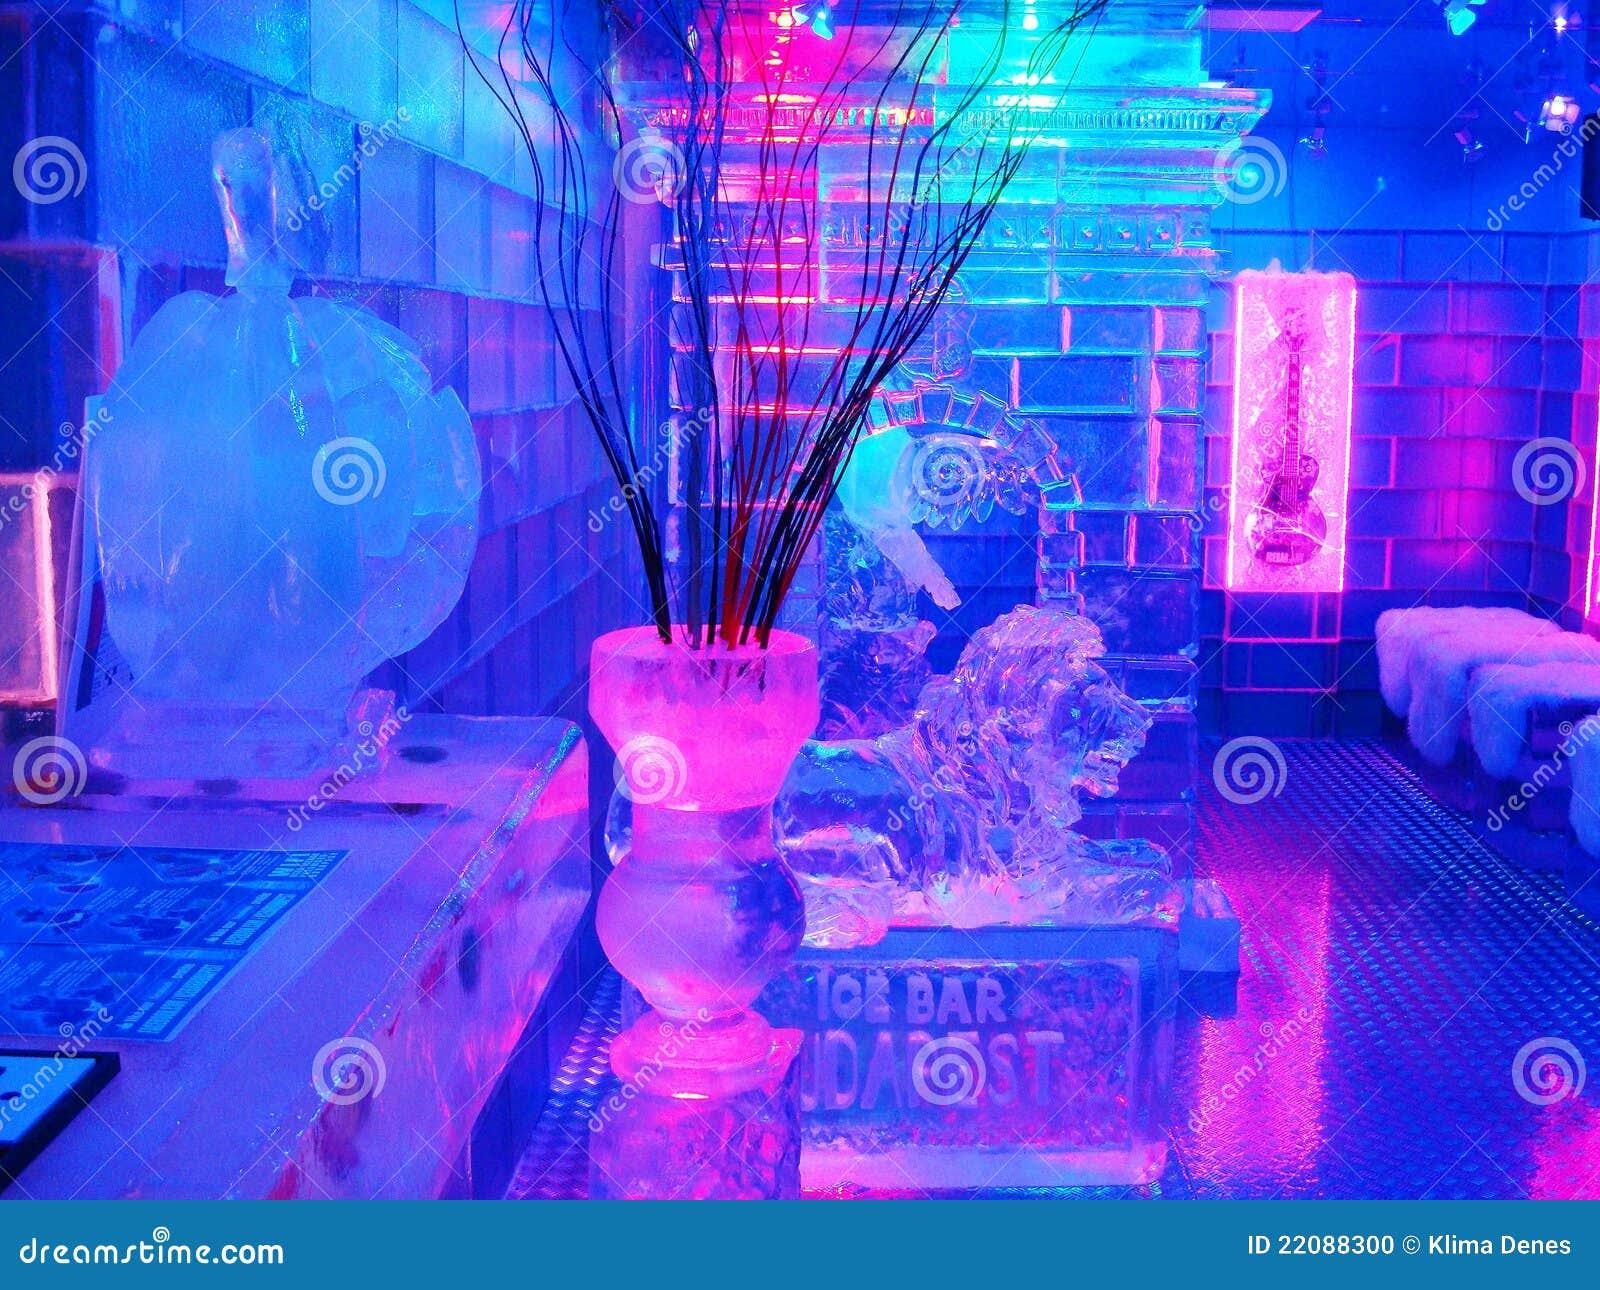 ice bar budapest jegbar budapest 22088300